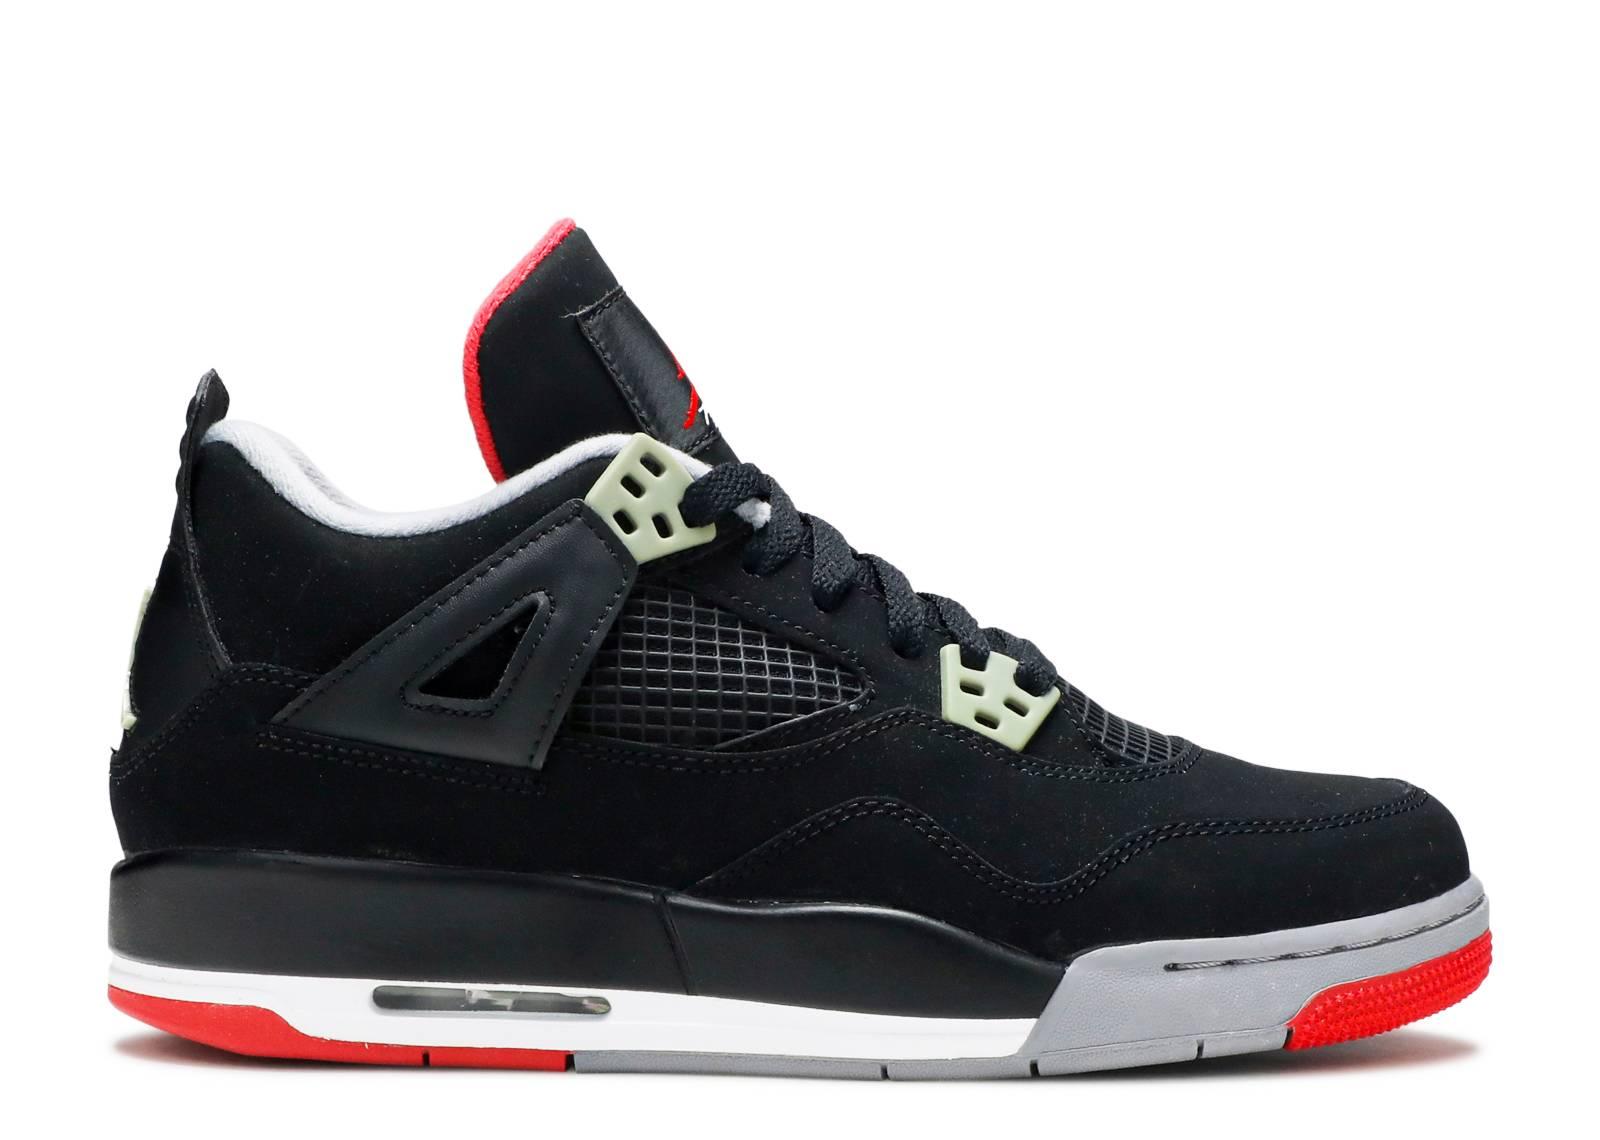 Air Jordan 4 Retro GS 'Bred' 2012